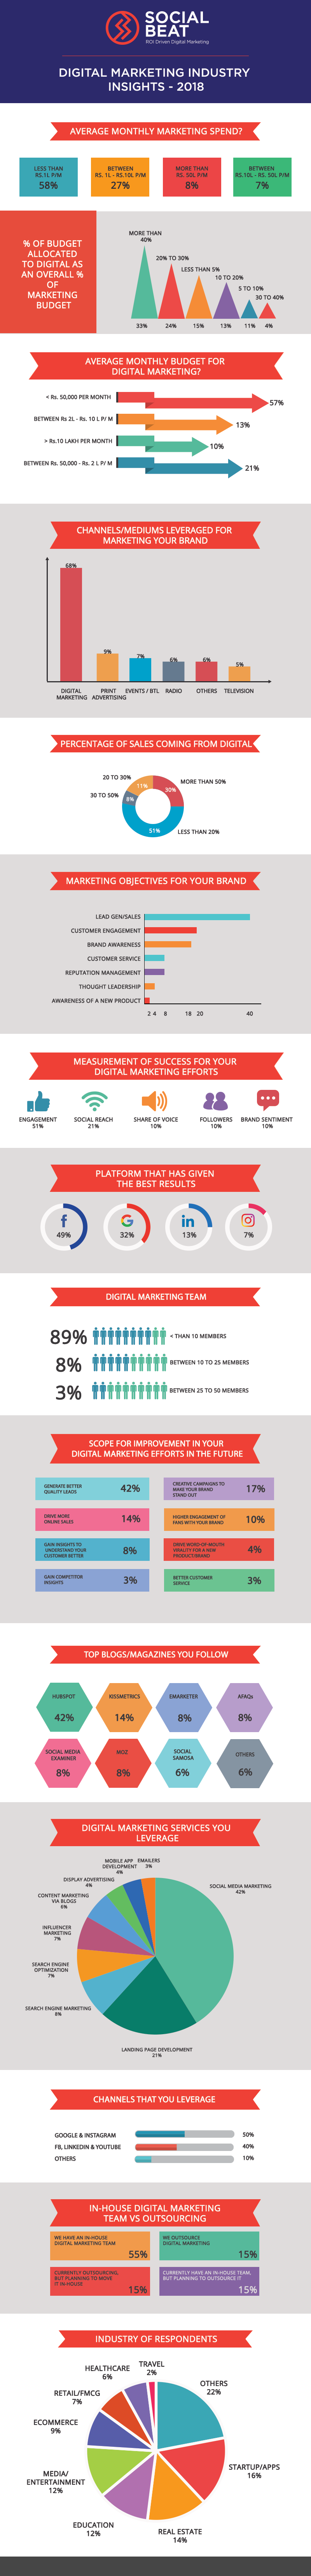 Digital Marketing Survey Report